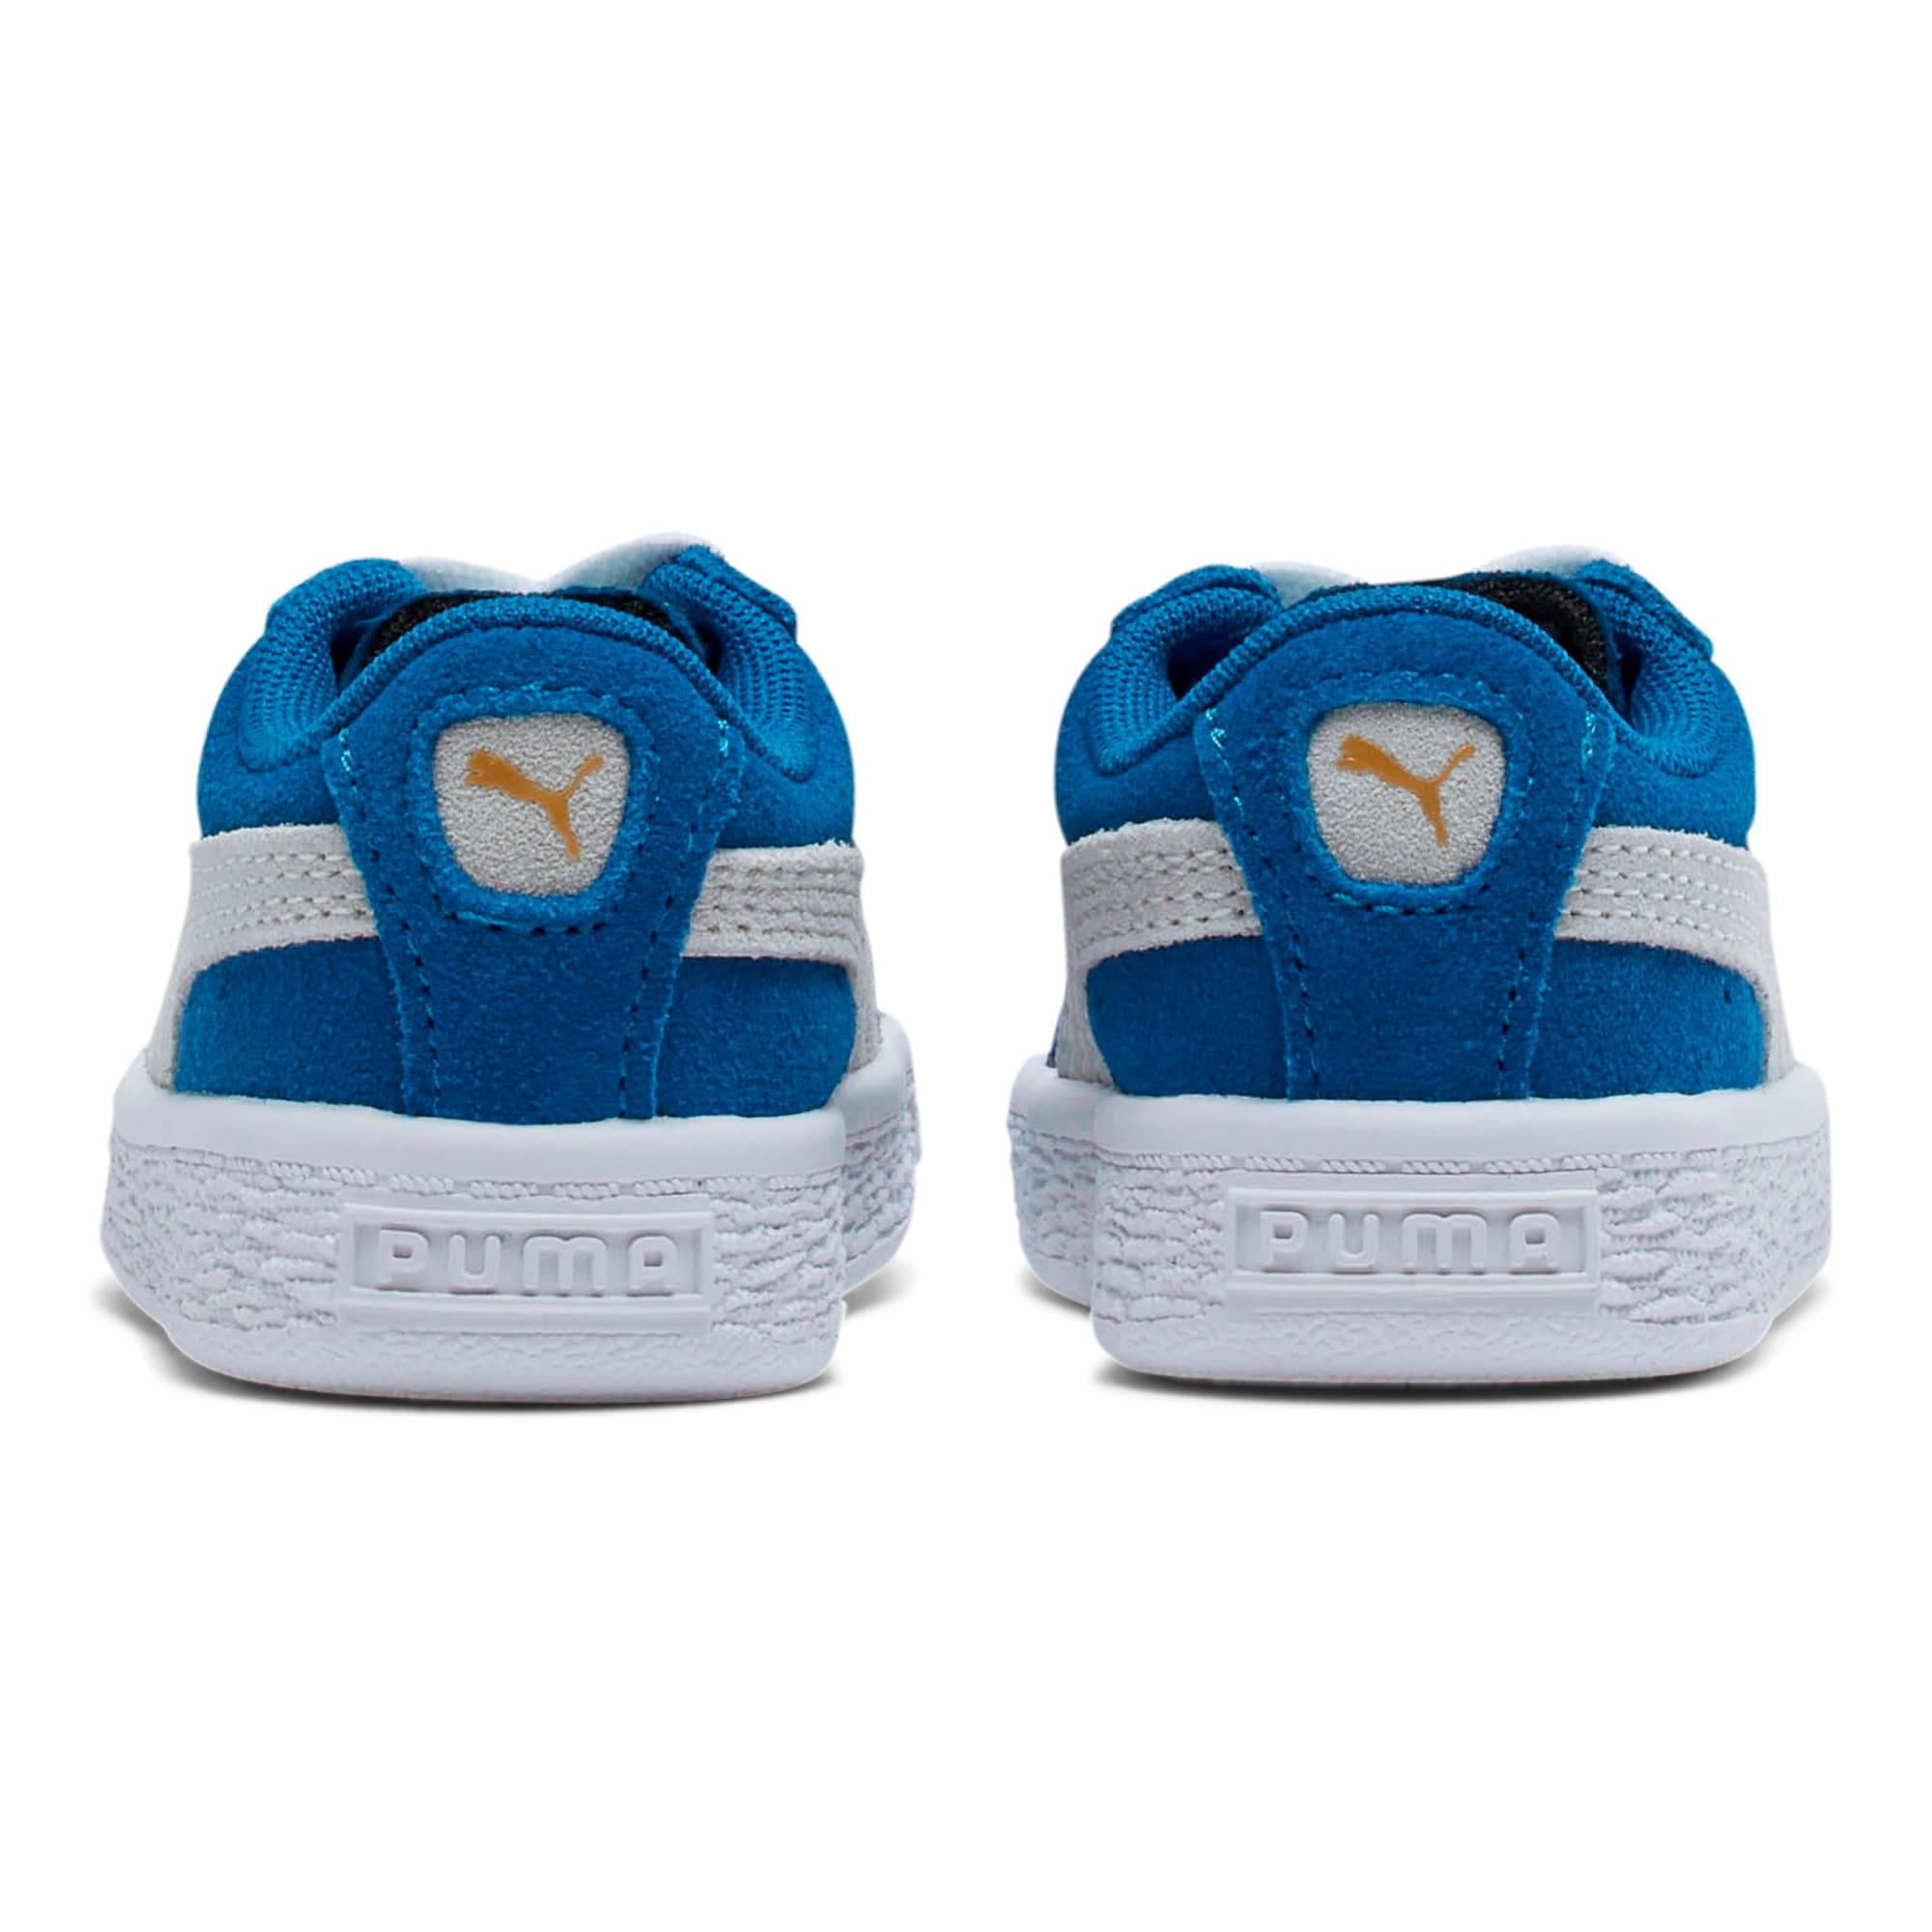 Thumbnail 4 of Puma Suede Toddler Shoes, Snorkel Blue-Puma White, medium